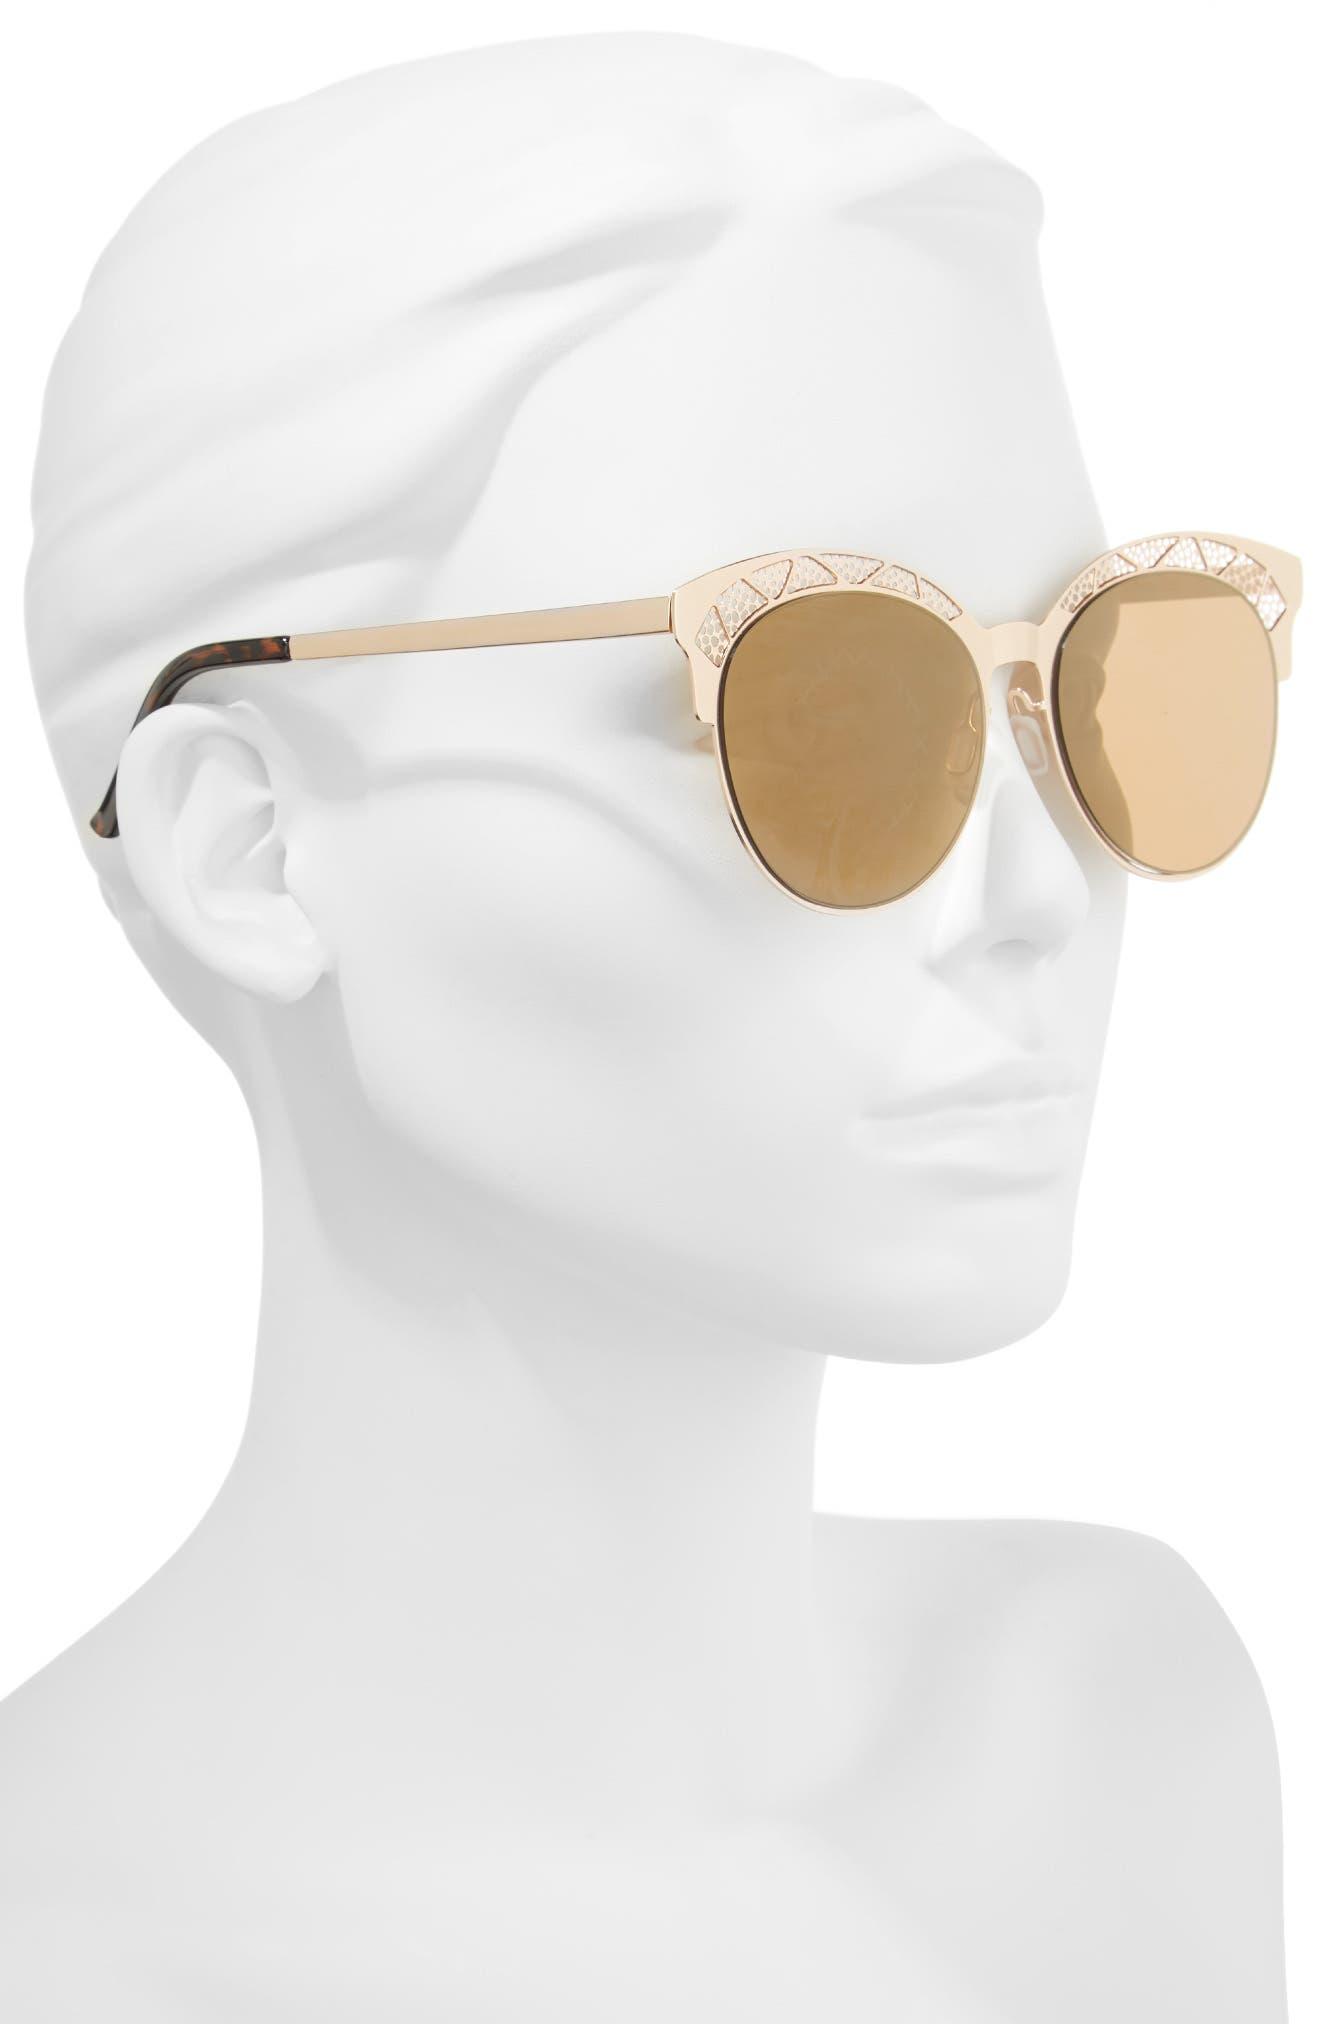 56mm Round Sunglasses,                             Alternate thumbnail 2, color,                             710